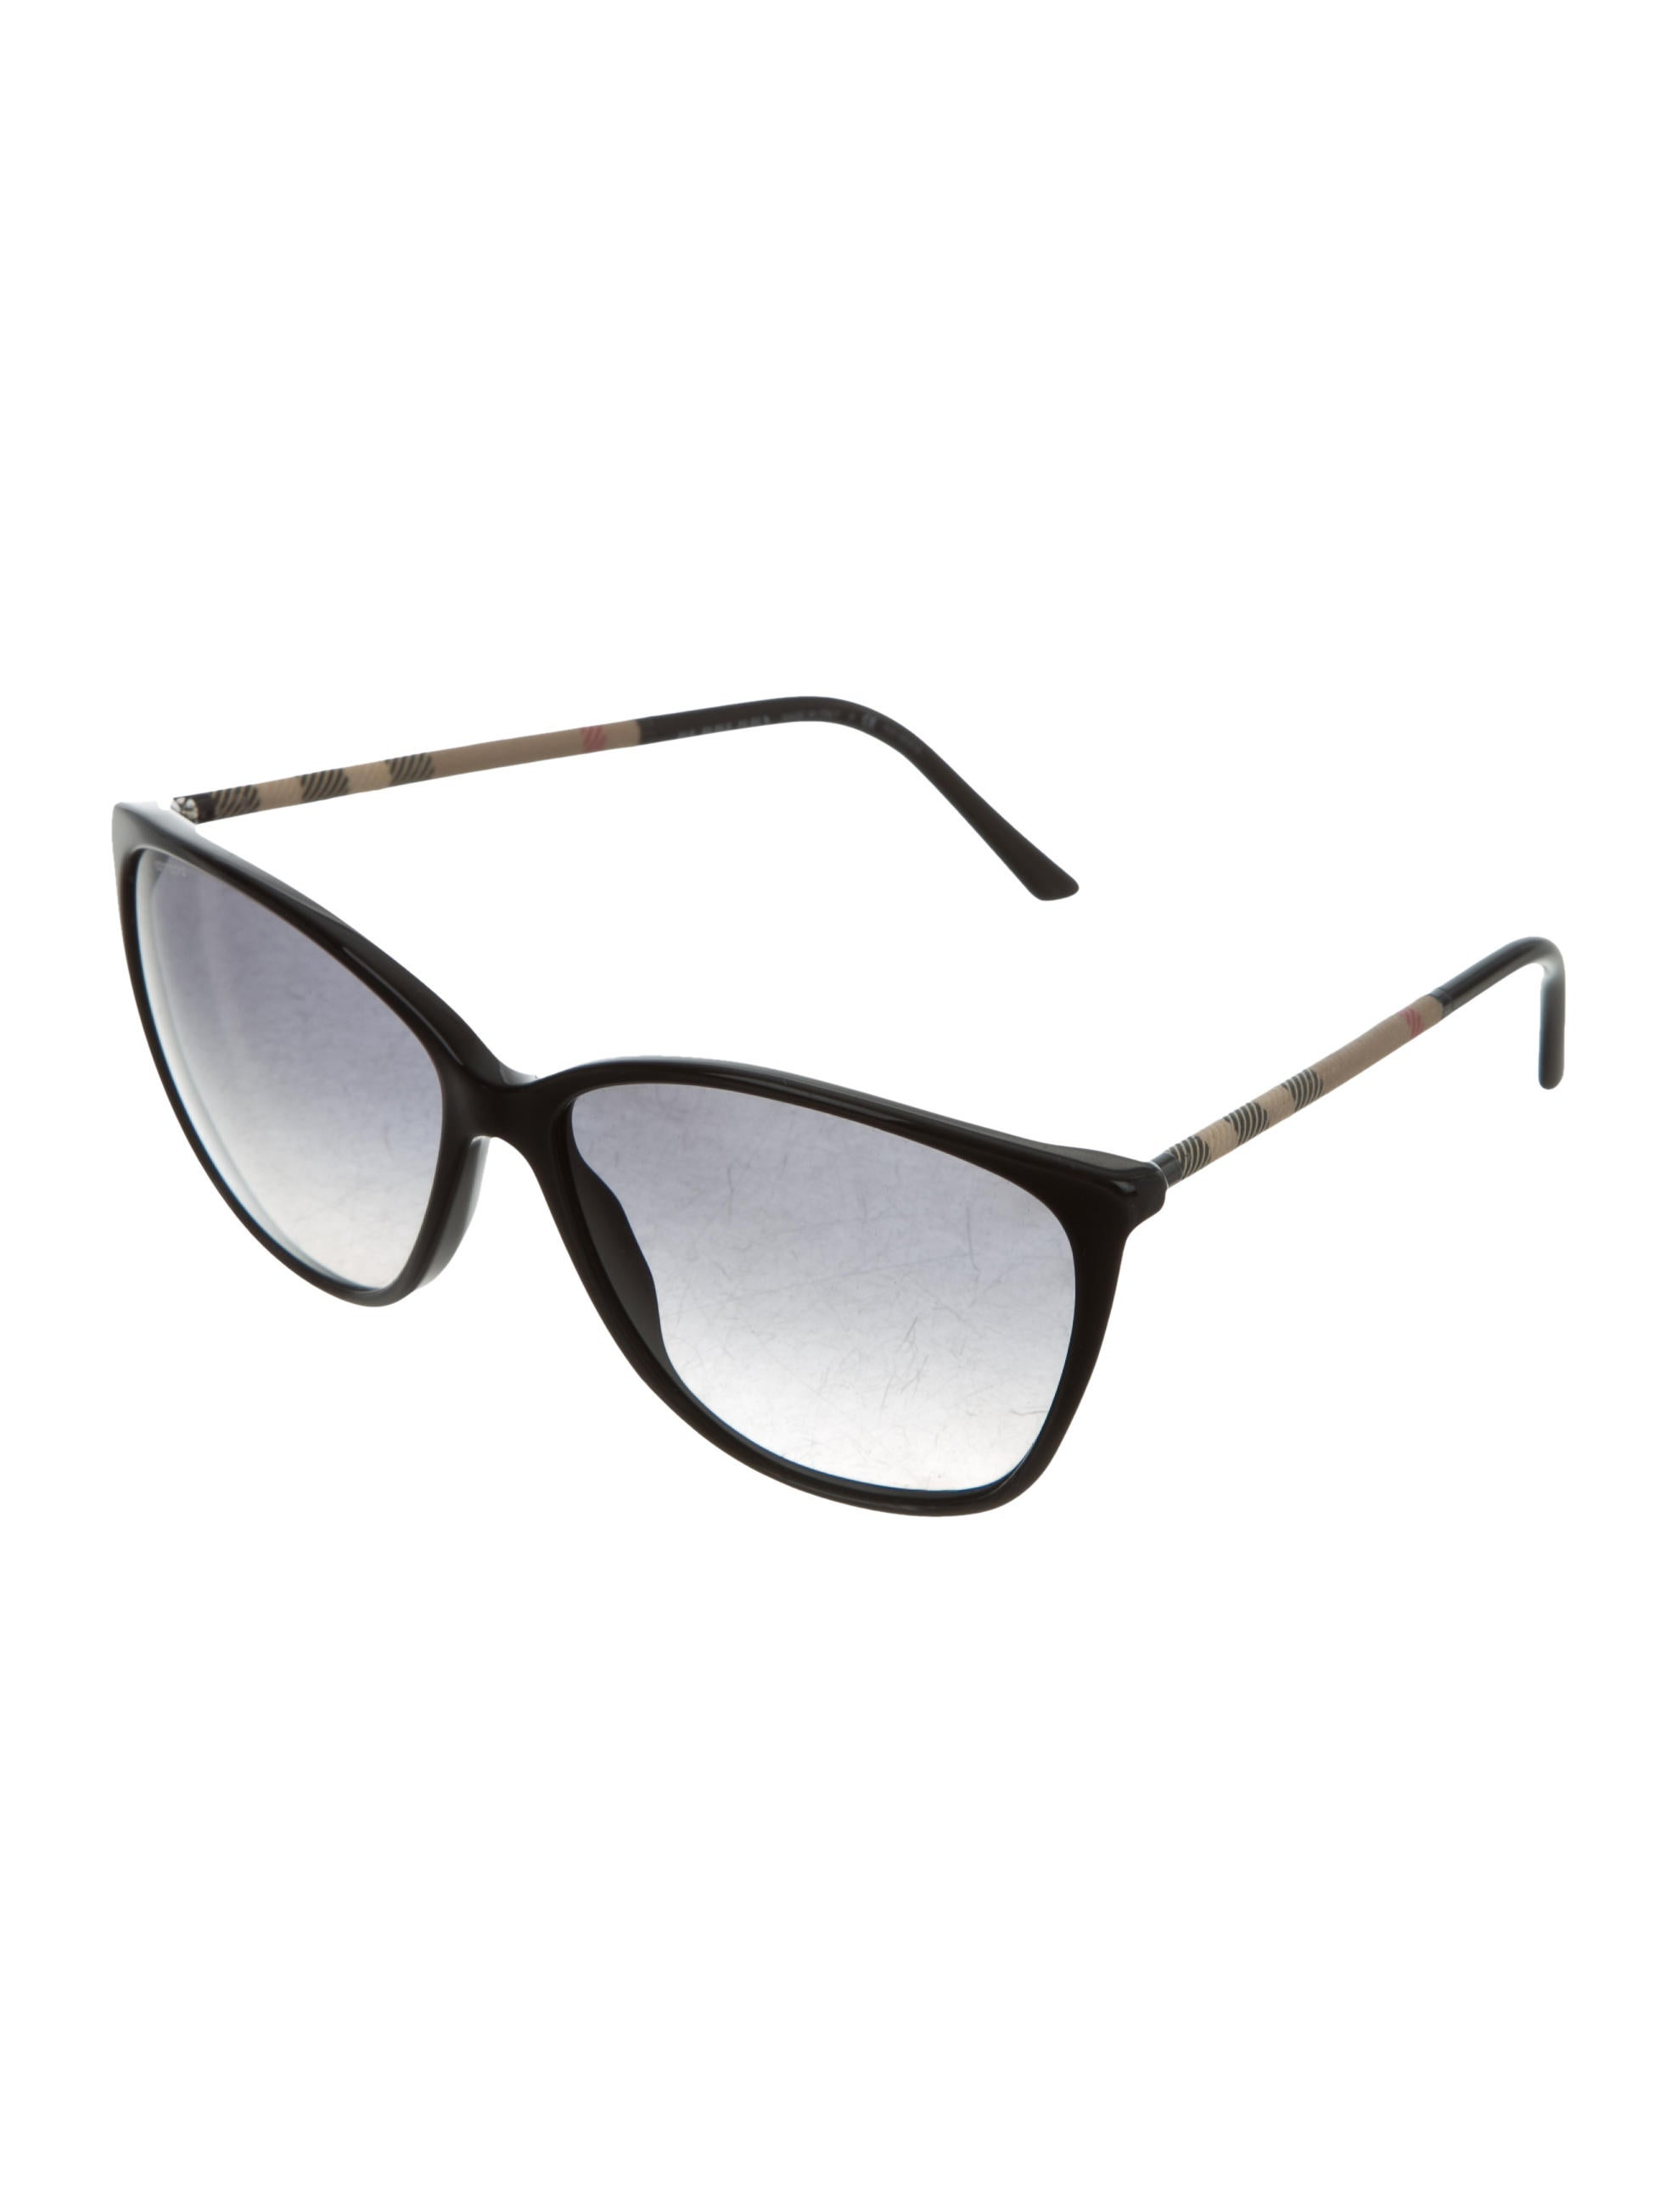 0413c915bc Burberry Nova Check Cat-Eye Sunglasses - Accessories - BUR67882